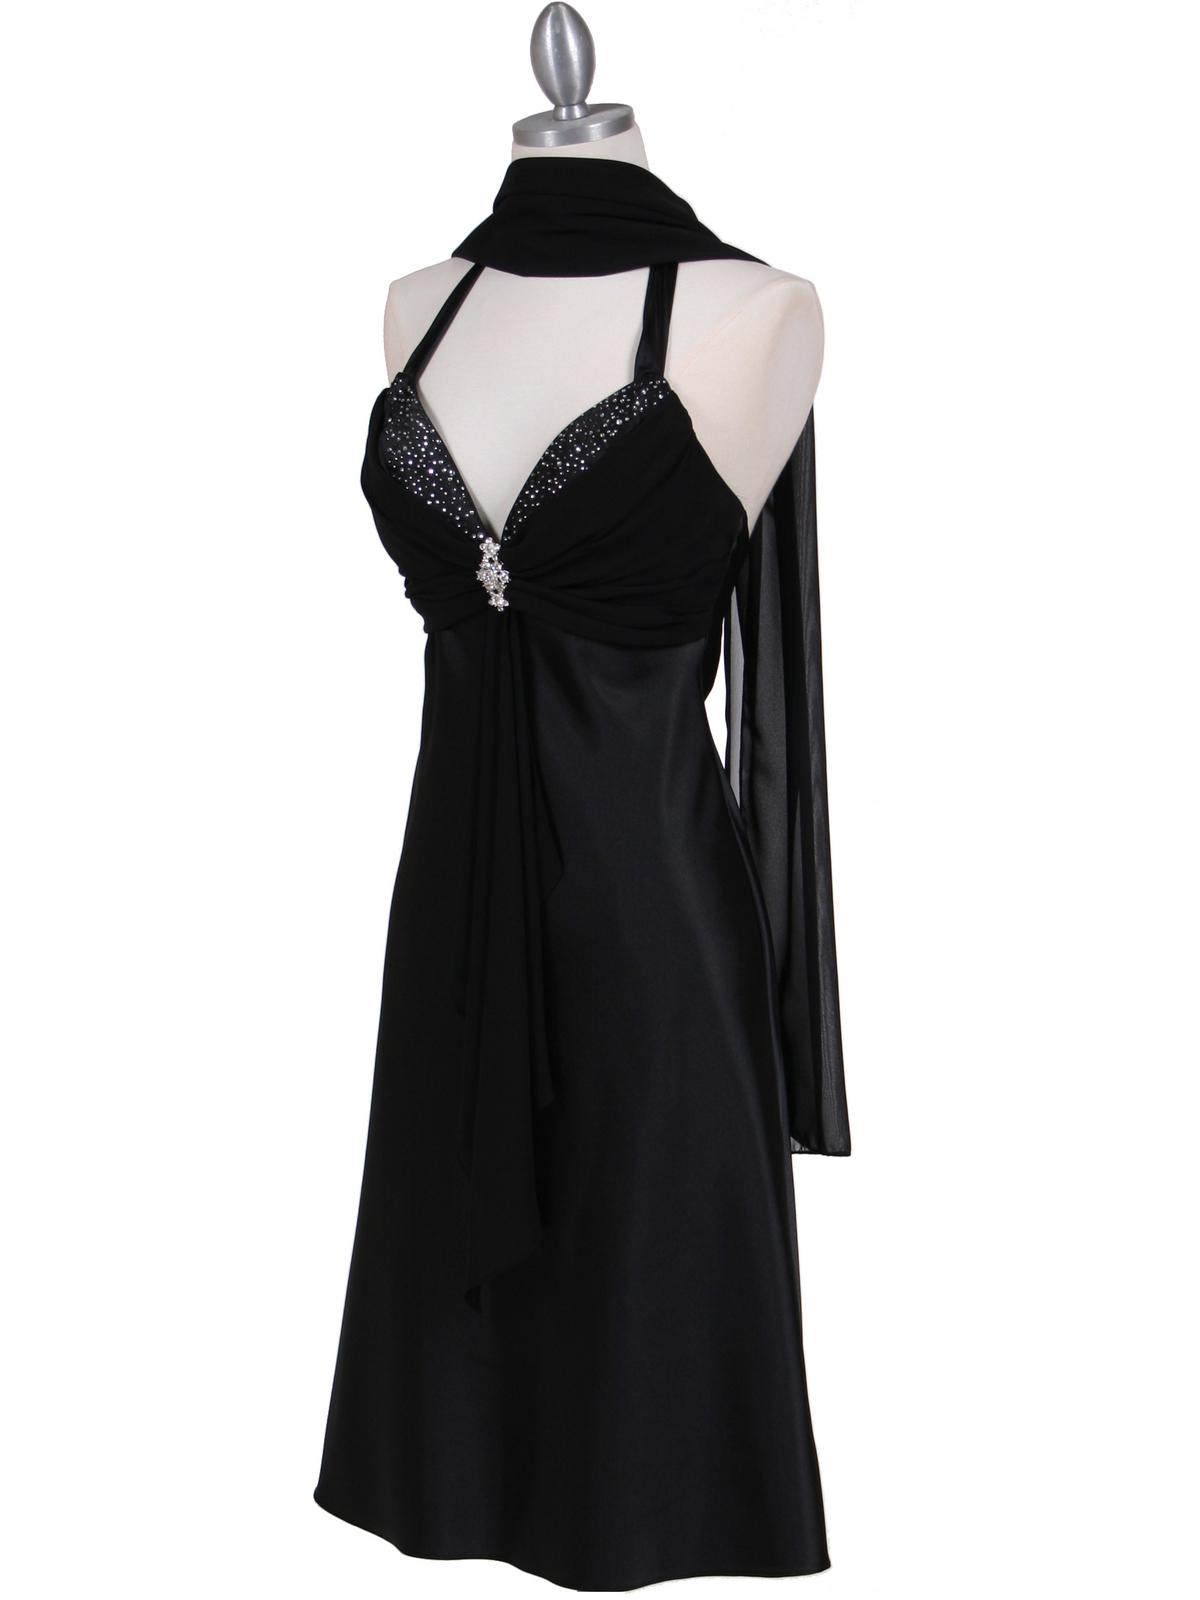 Halter Style Cocktail Dresses